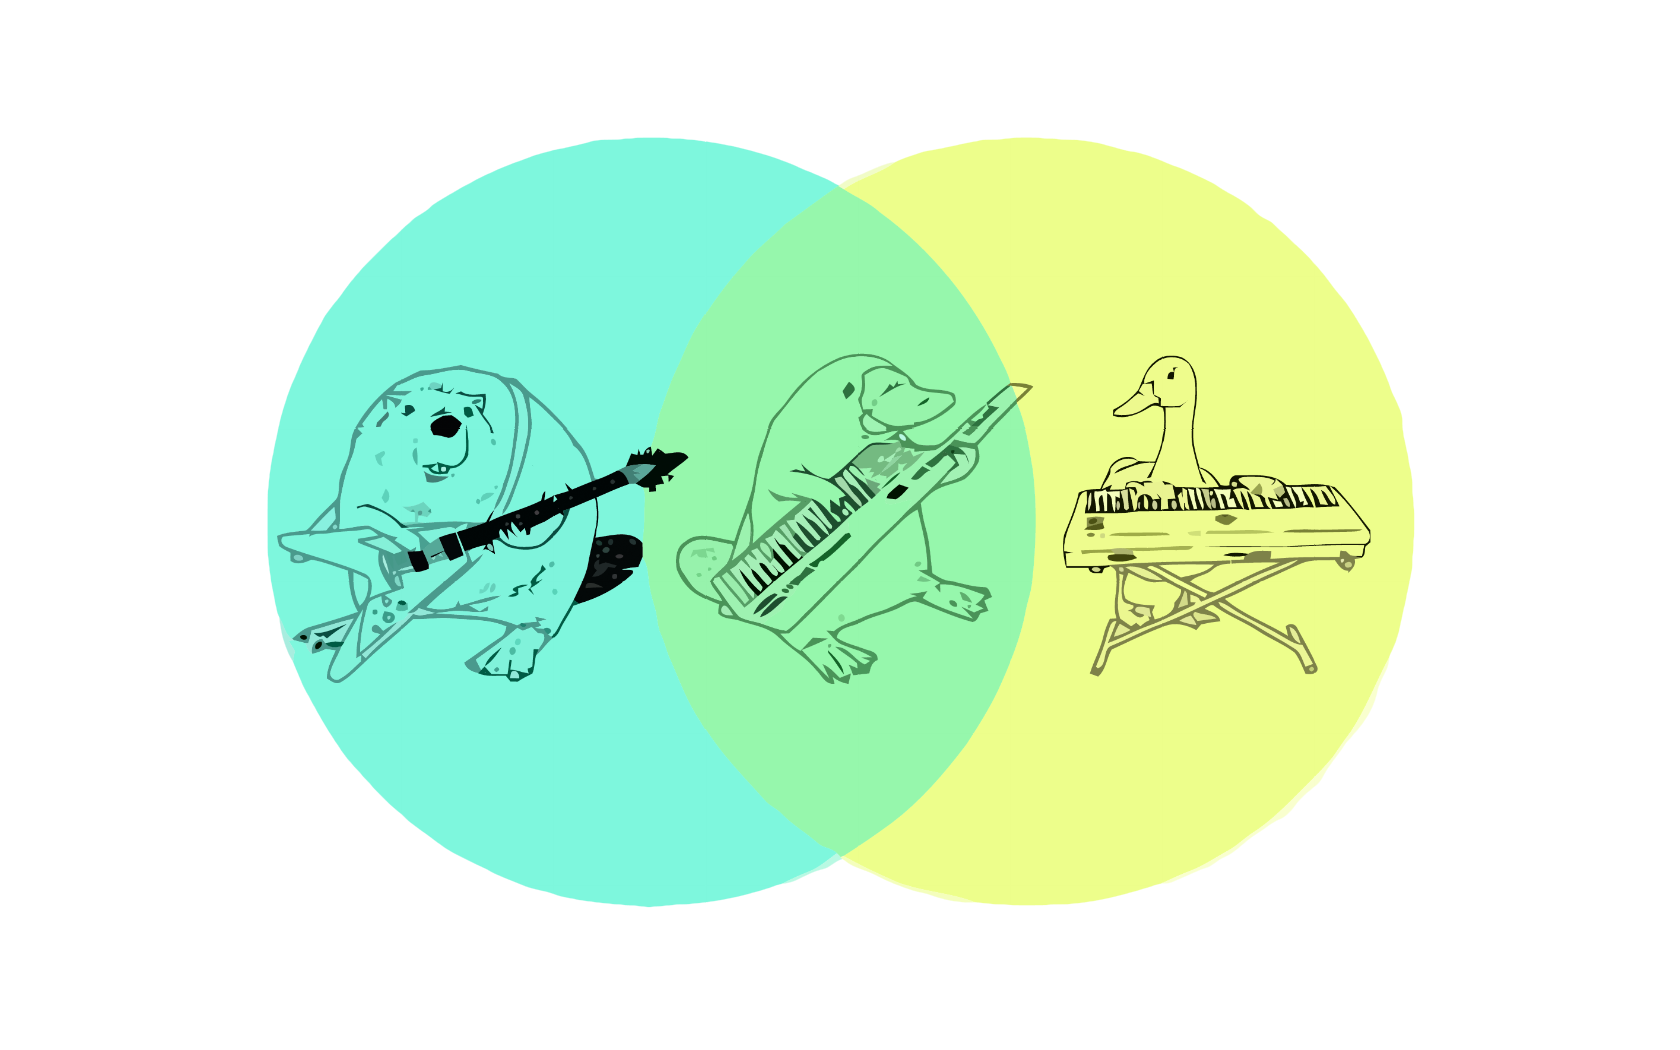 platypus keytar venn diagram